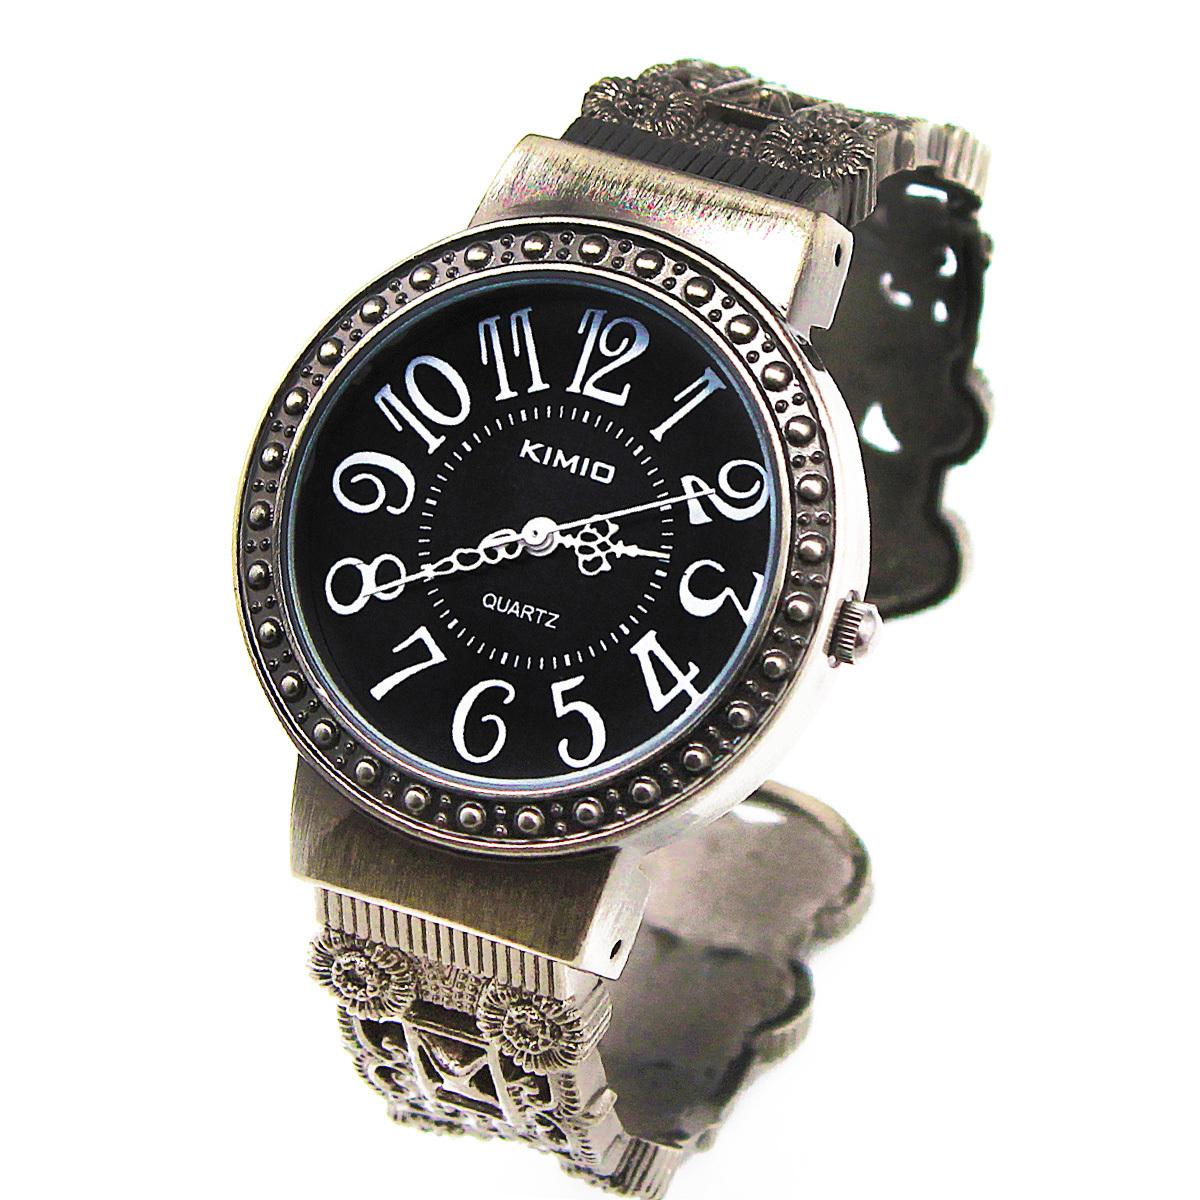 Часы Kimio 2933 Кварцевые часы Женские Китай 2011